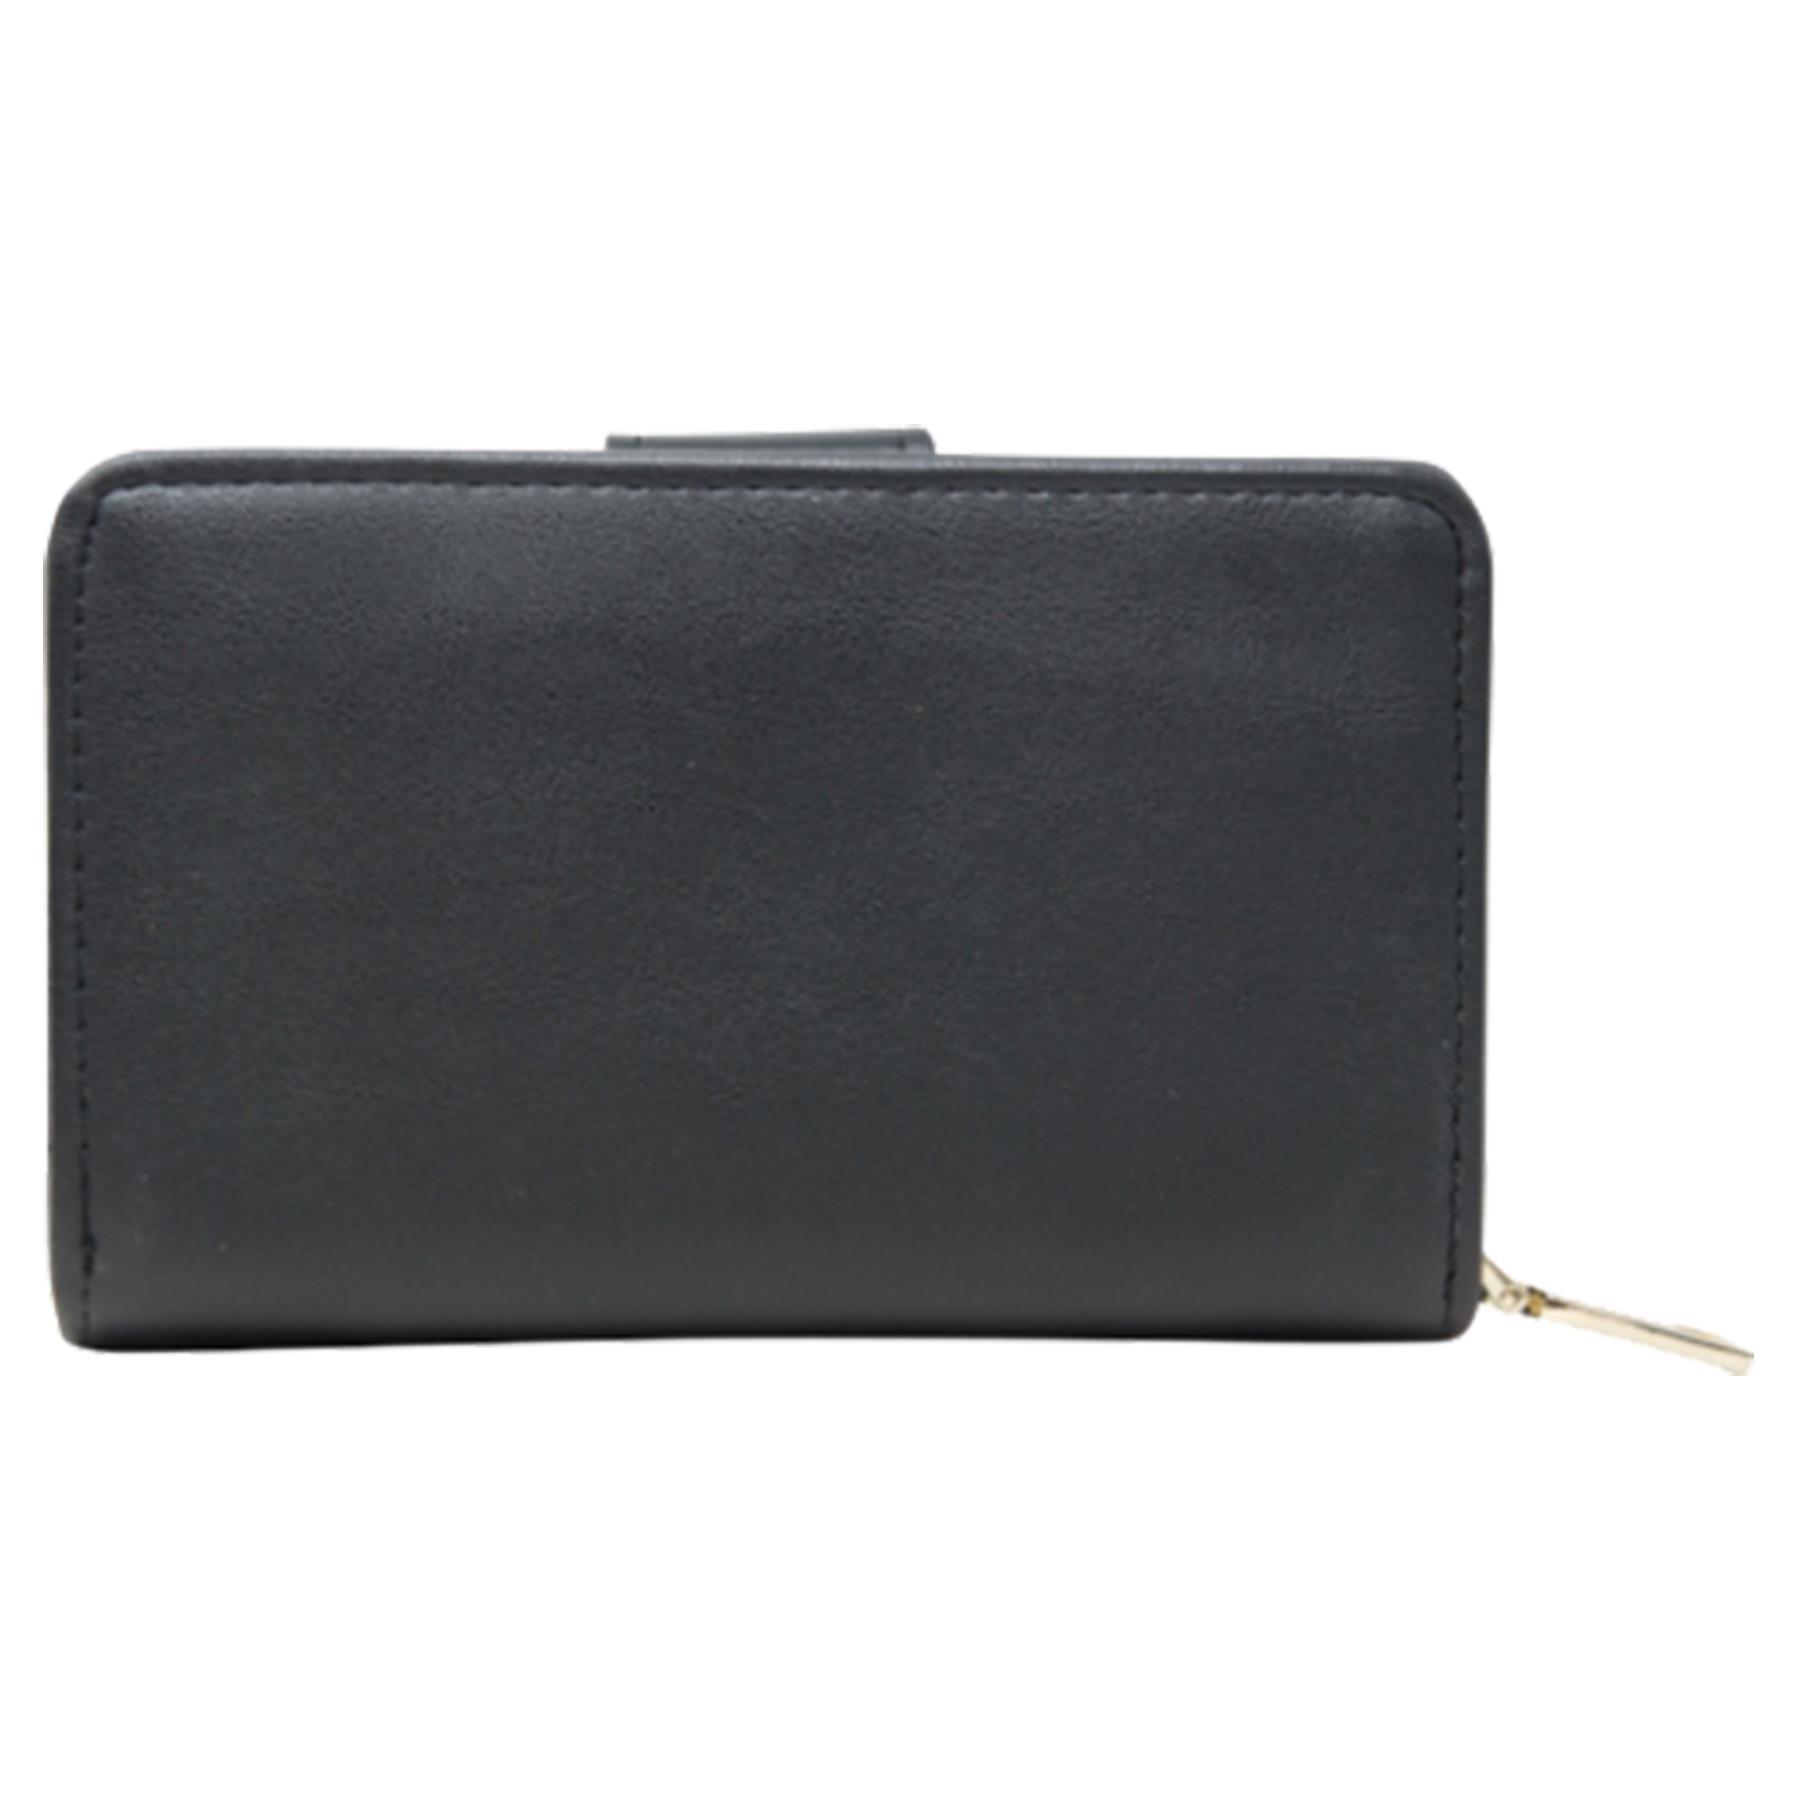 New-Ladies-Card-Slots-Zipped-Pocket-Faux-Leather-Basic-Wallet-Purse thumbnail 4